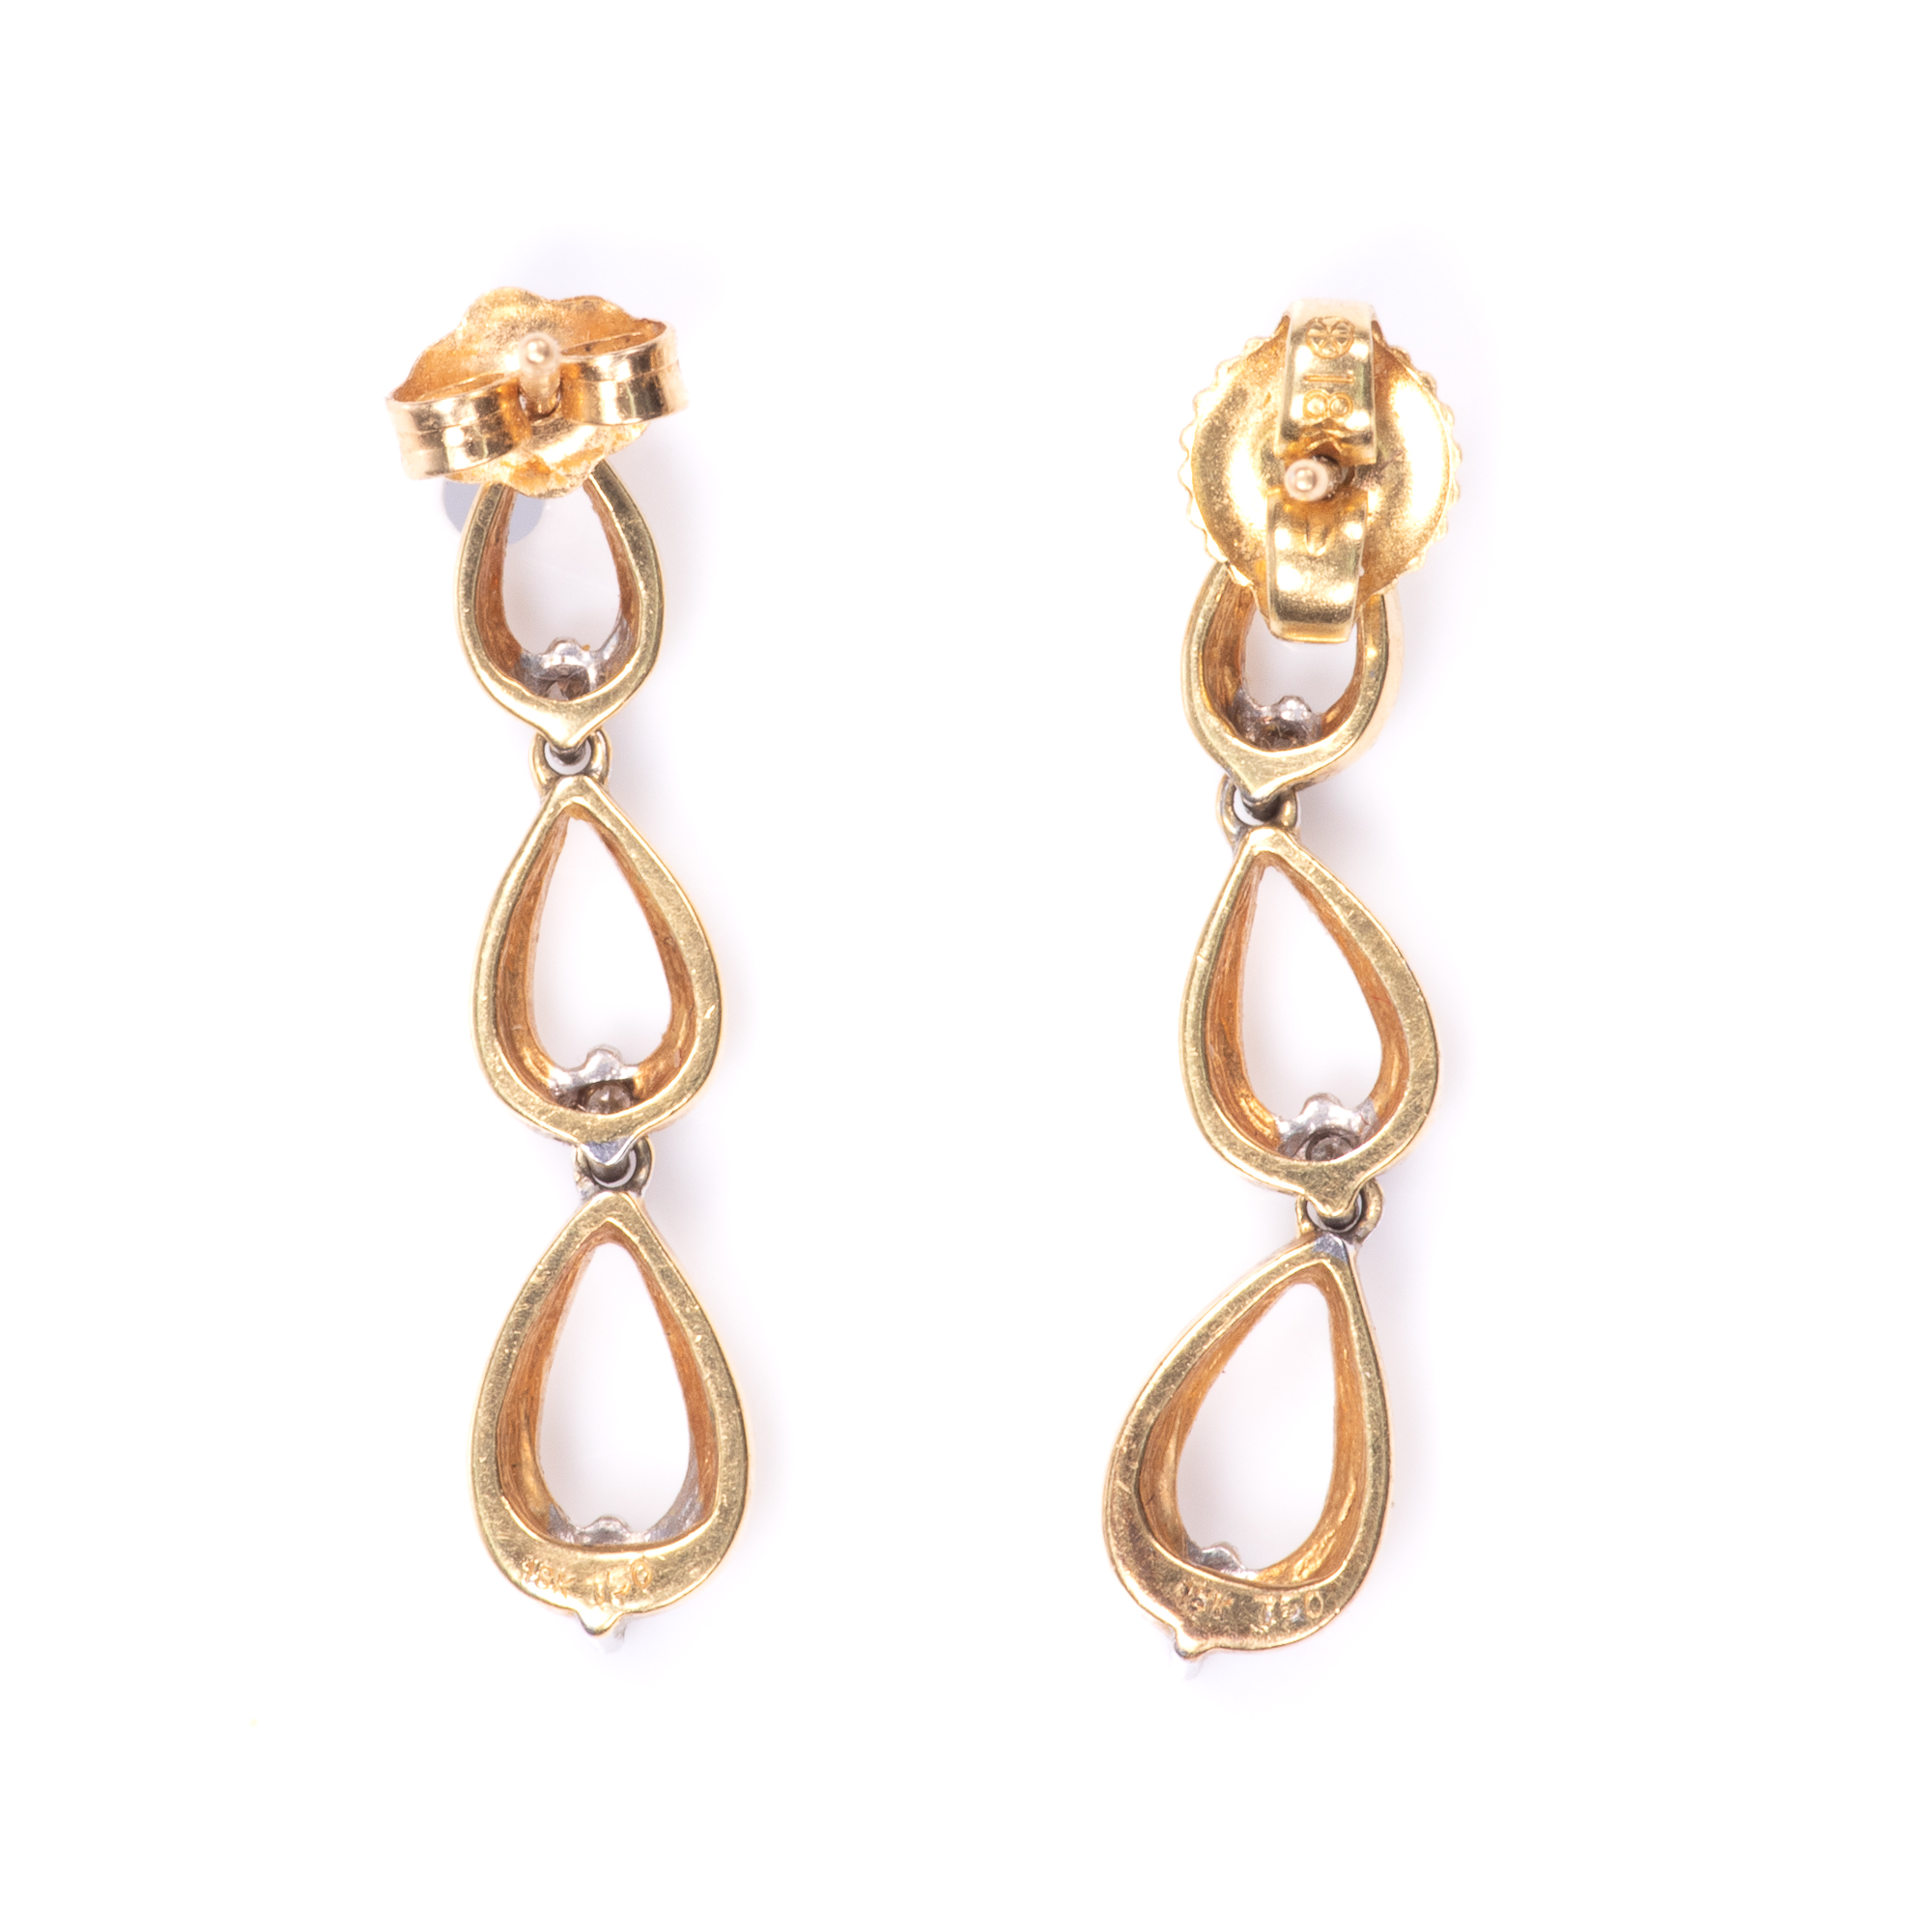 18ct Gold Diamond Earrings - Image 6 of 6